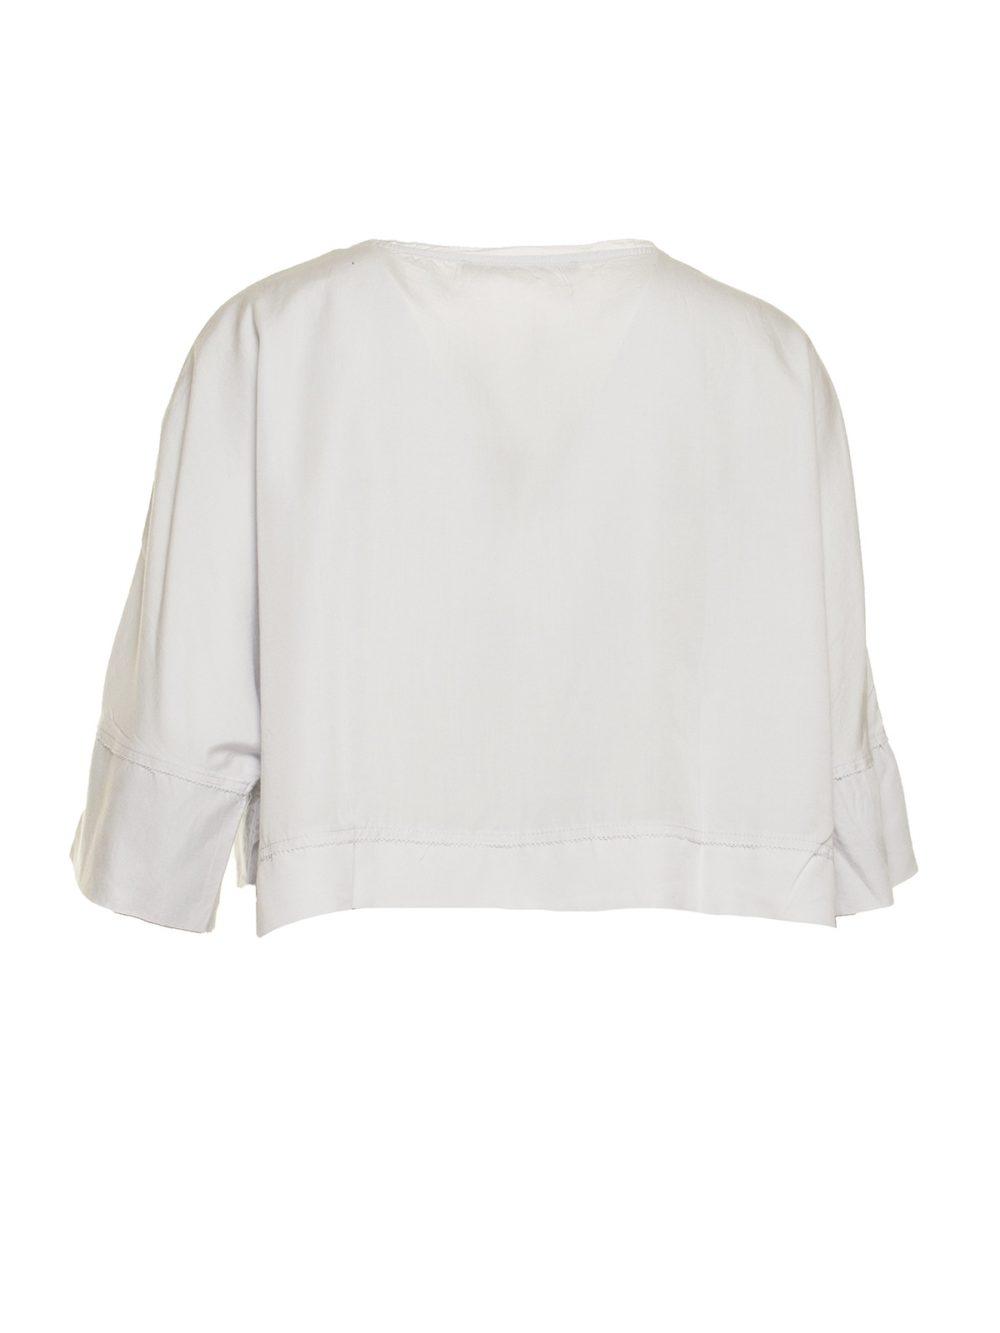 Vari Shirt Elemente Clemente Katie Kerr Women's Clothing